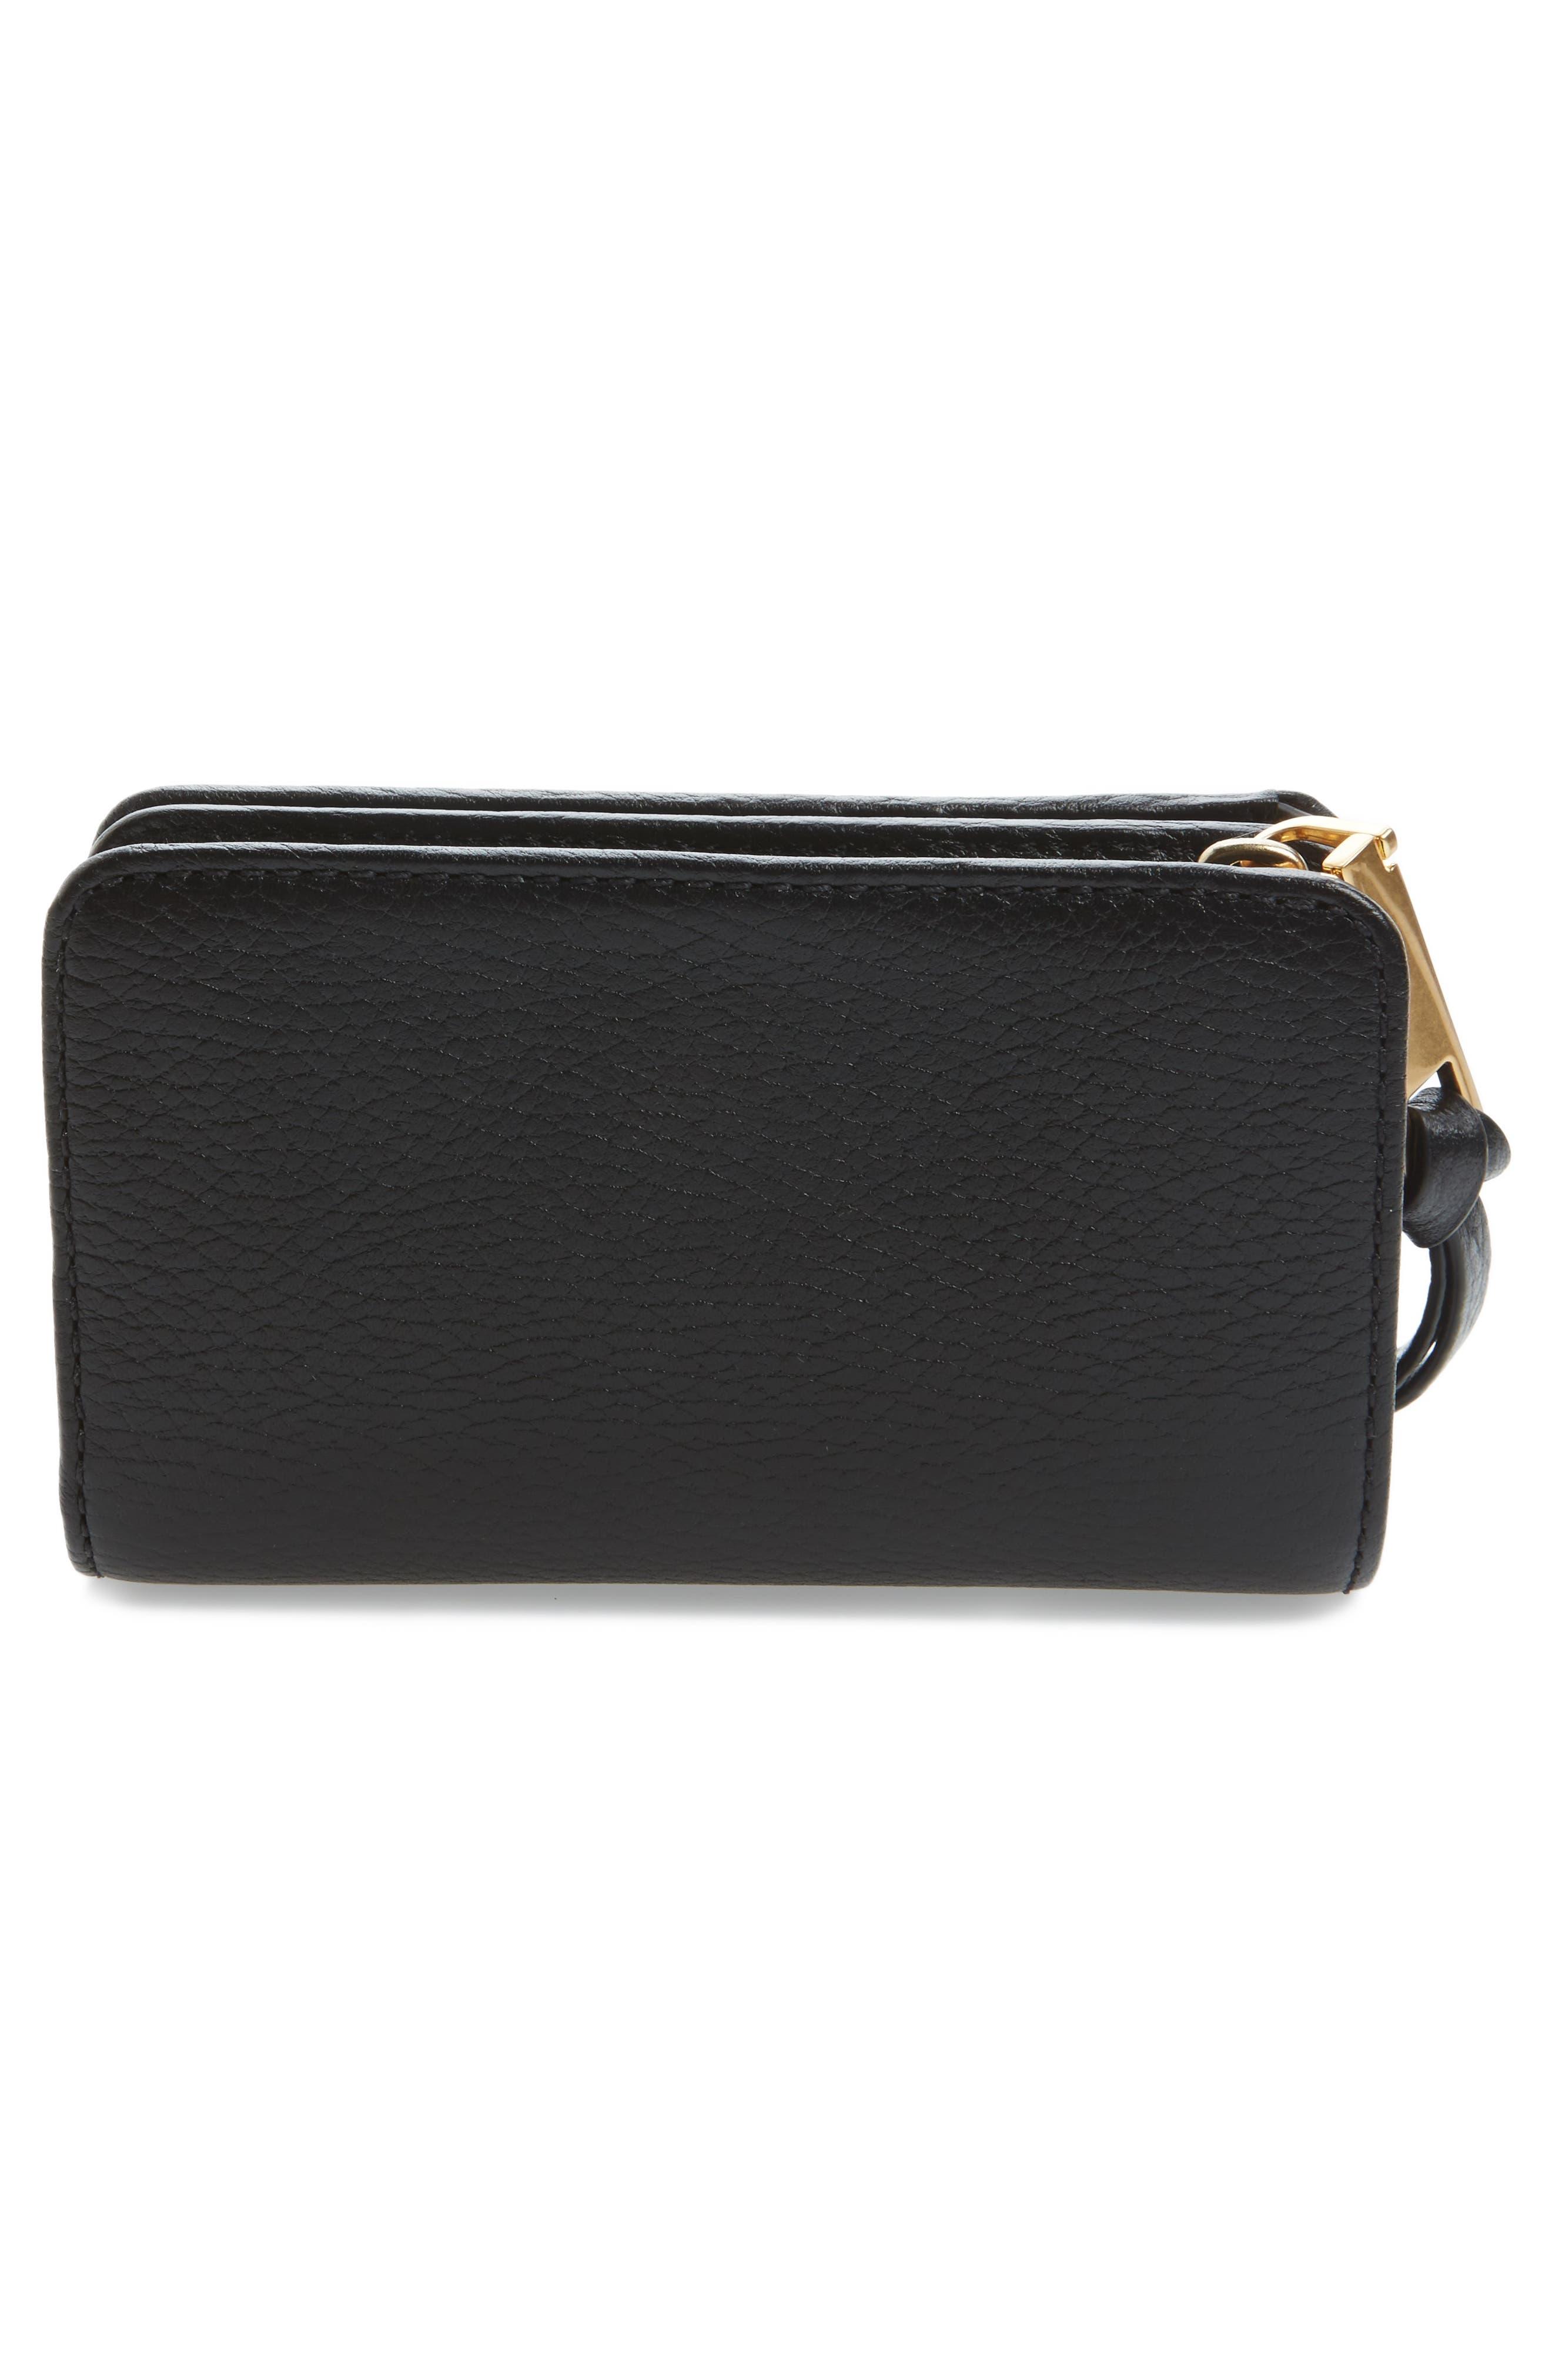 Recruit Compact Wallet,                             Alternate thumbnail 3, color,                             001